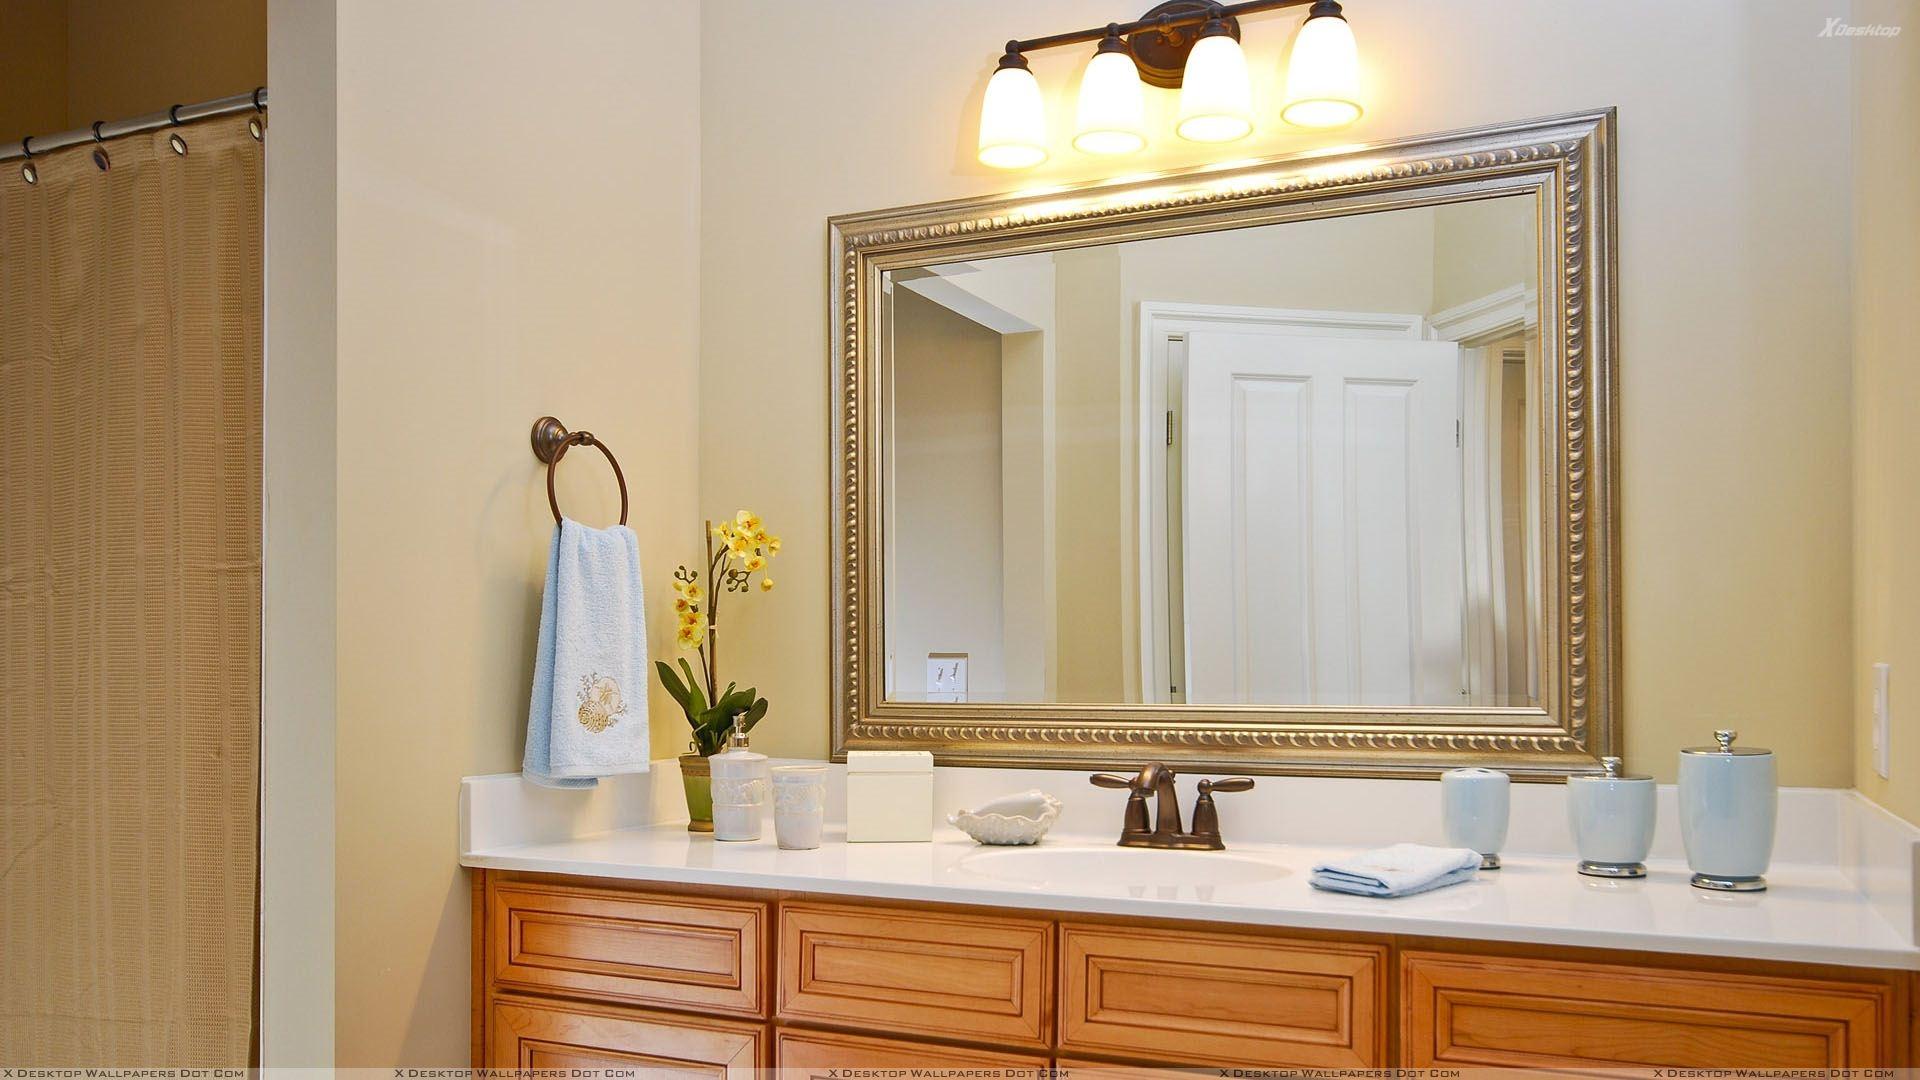 Decorative Framed Mirrors For Bathroom